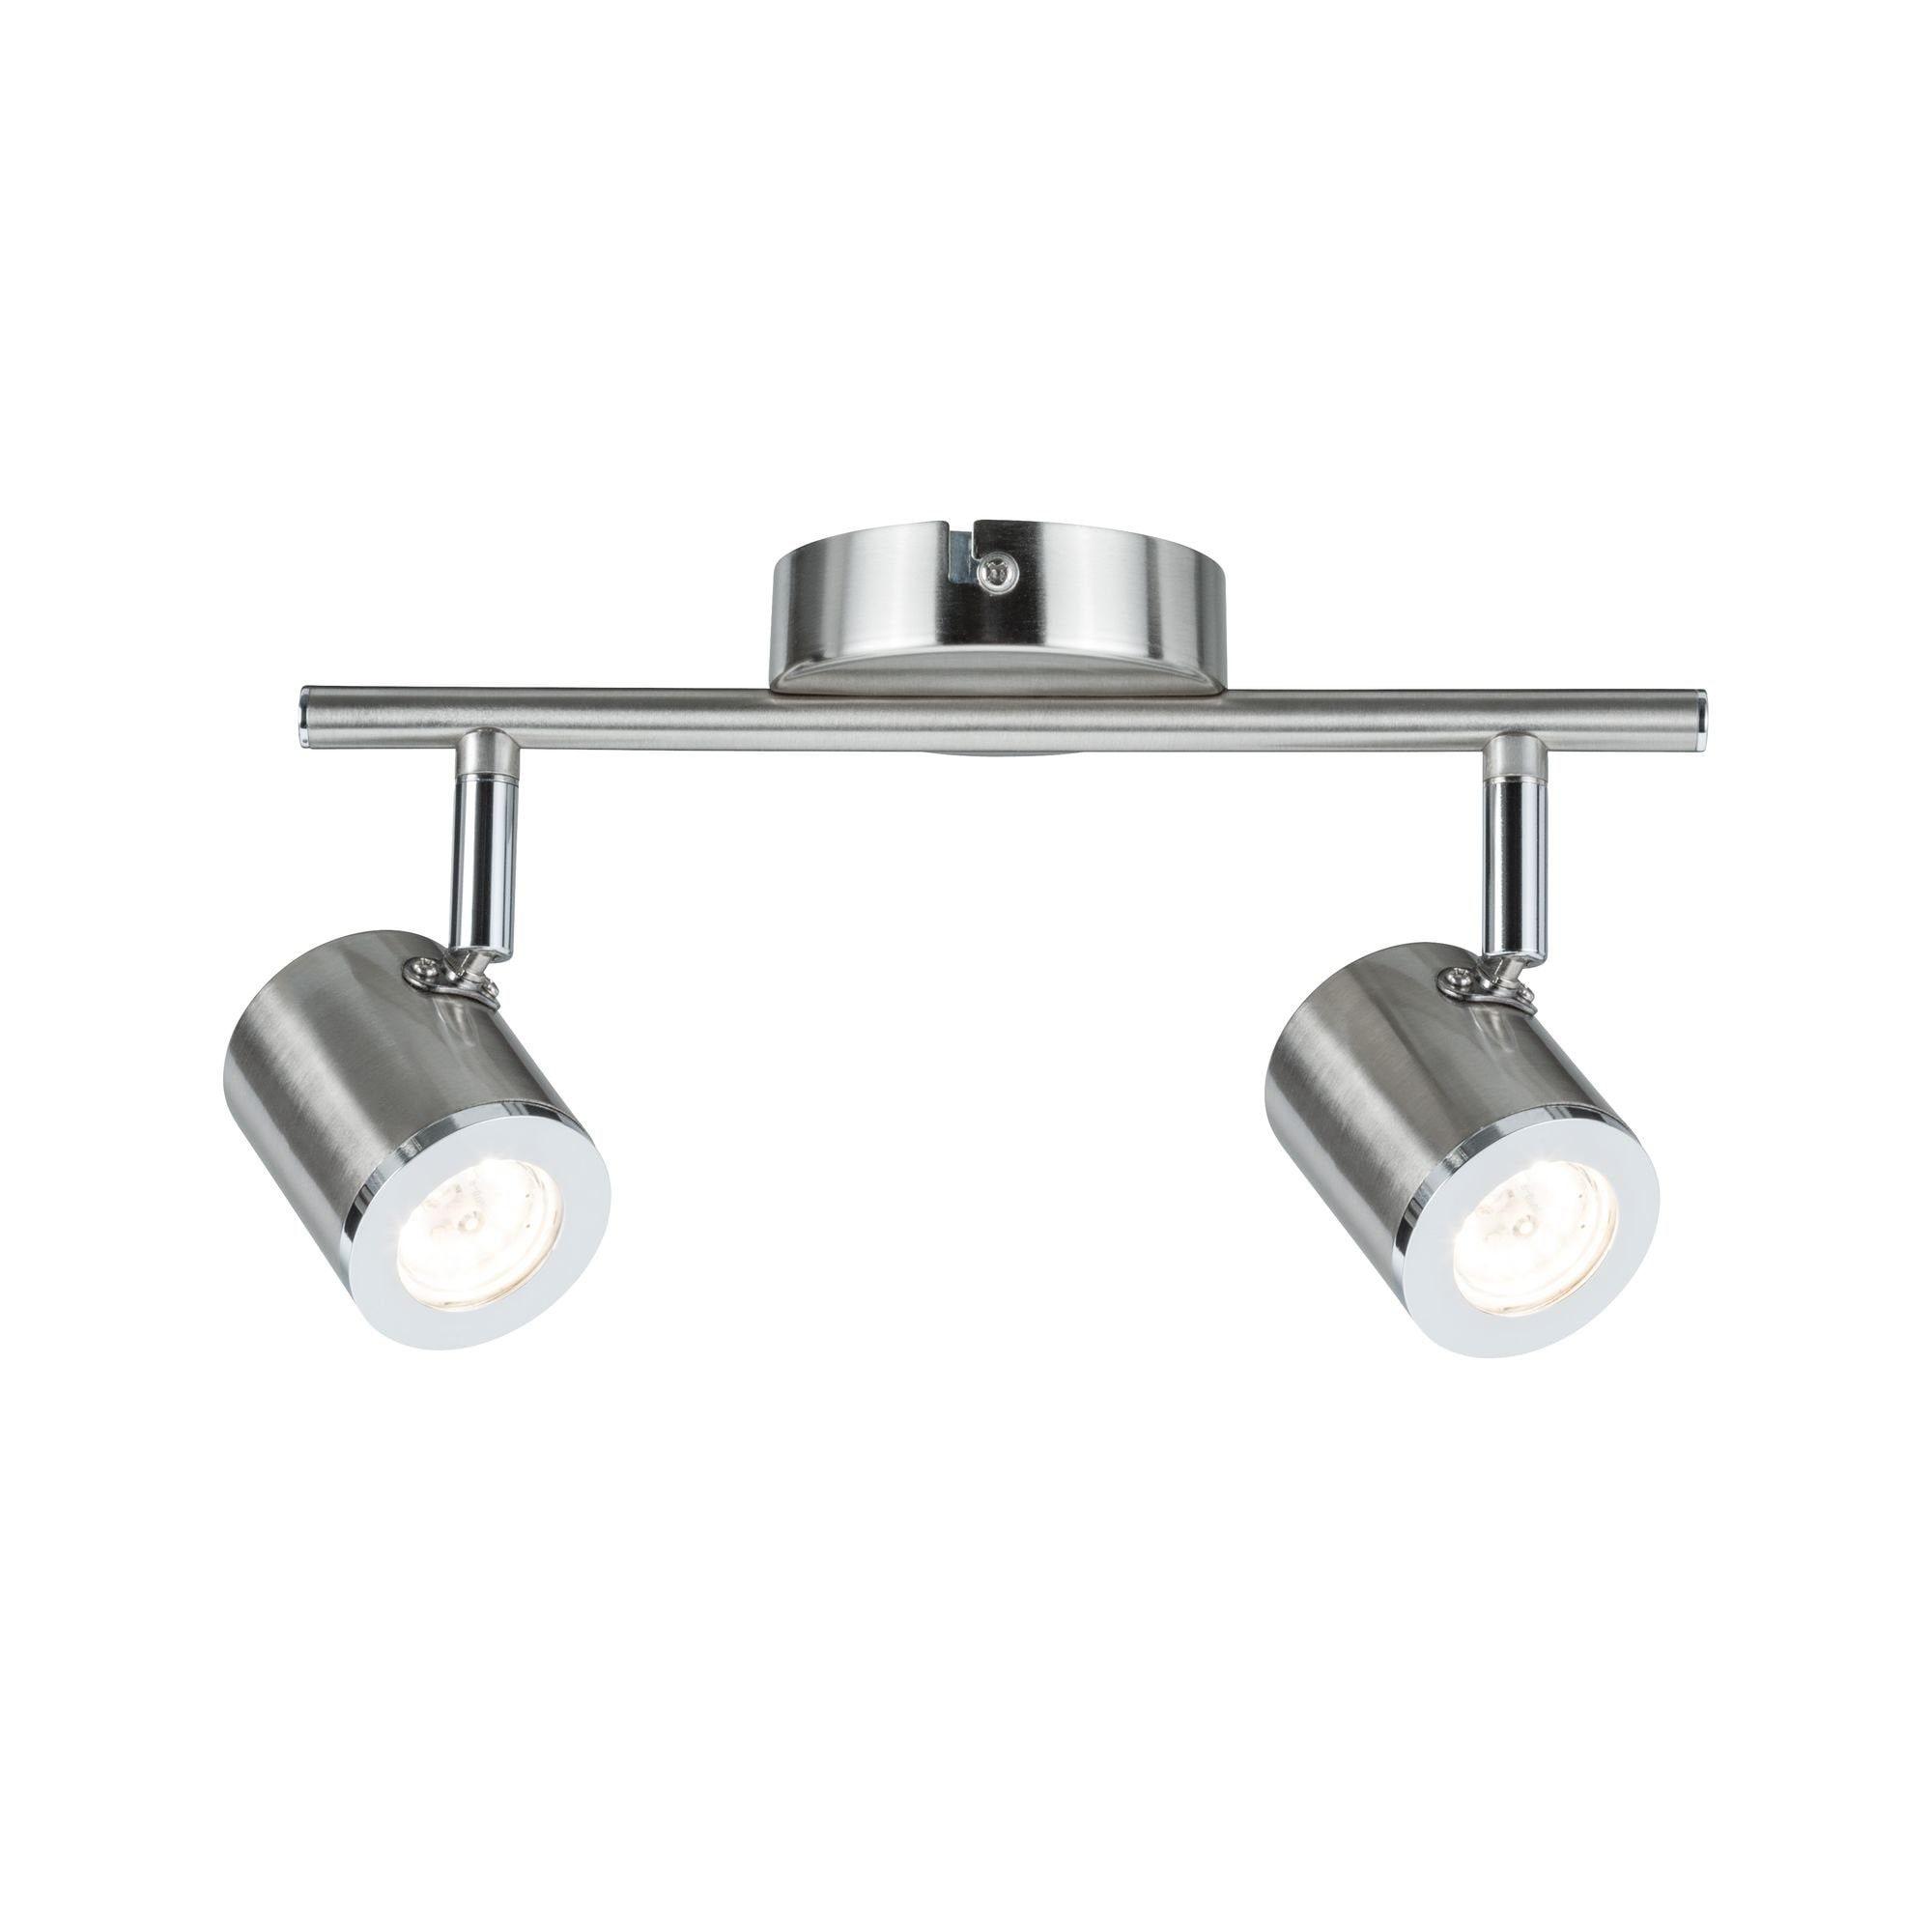 Paulmann,LED Deckenleuchte 2er-Spot Nickel Silberfarben Tumbler 2x4,5W